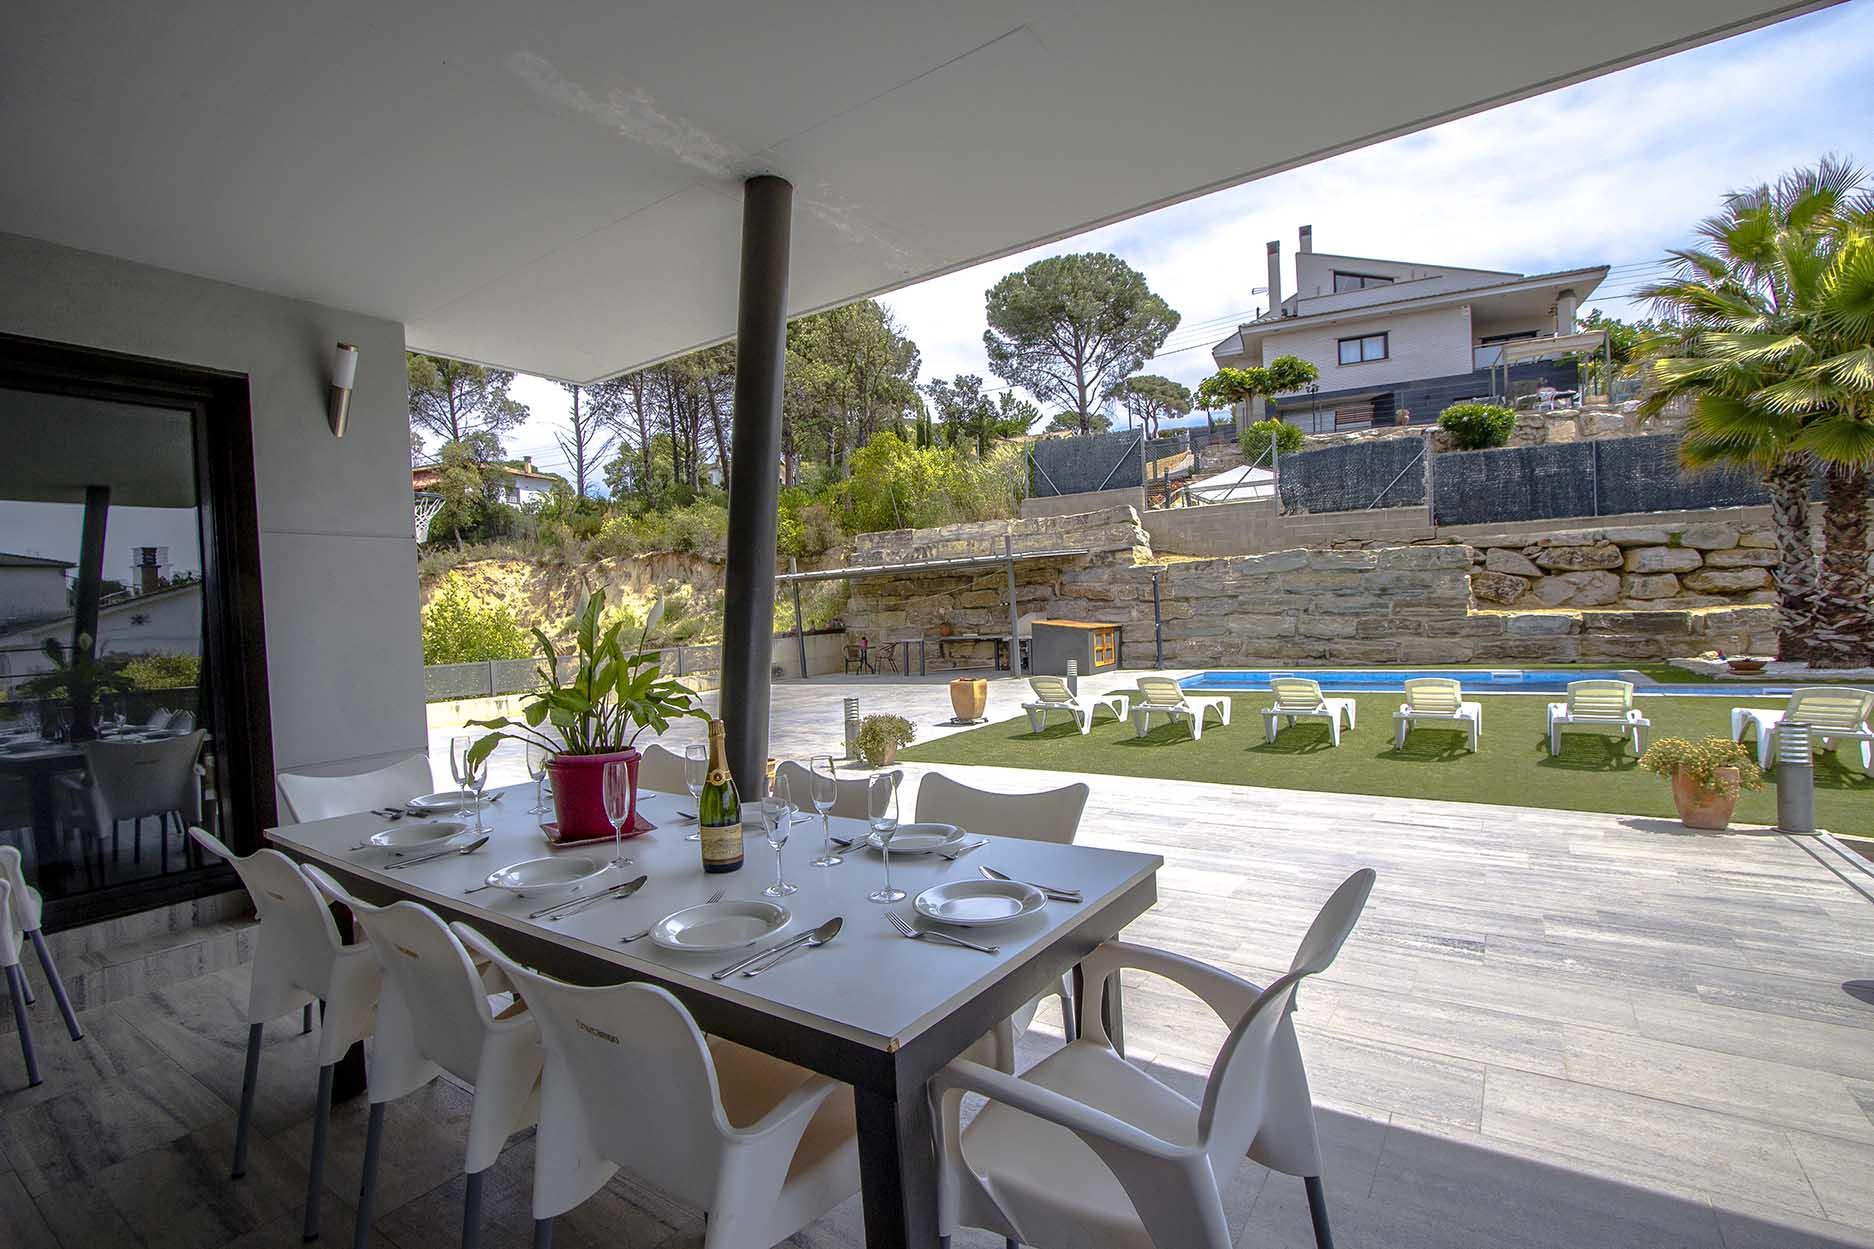 Ferienhaus Catalunya Casas: Modern villa in Sils, 15 min drive to Costa Brava beaches! (1902227), Les Mallorquines, Girona, Katalonien, Spanien, Bild 8